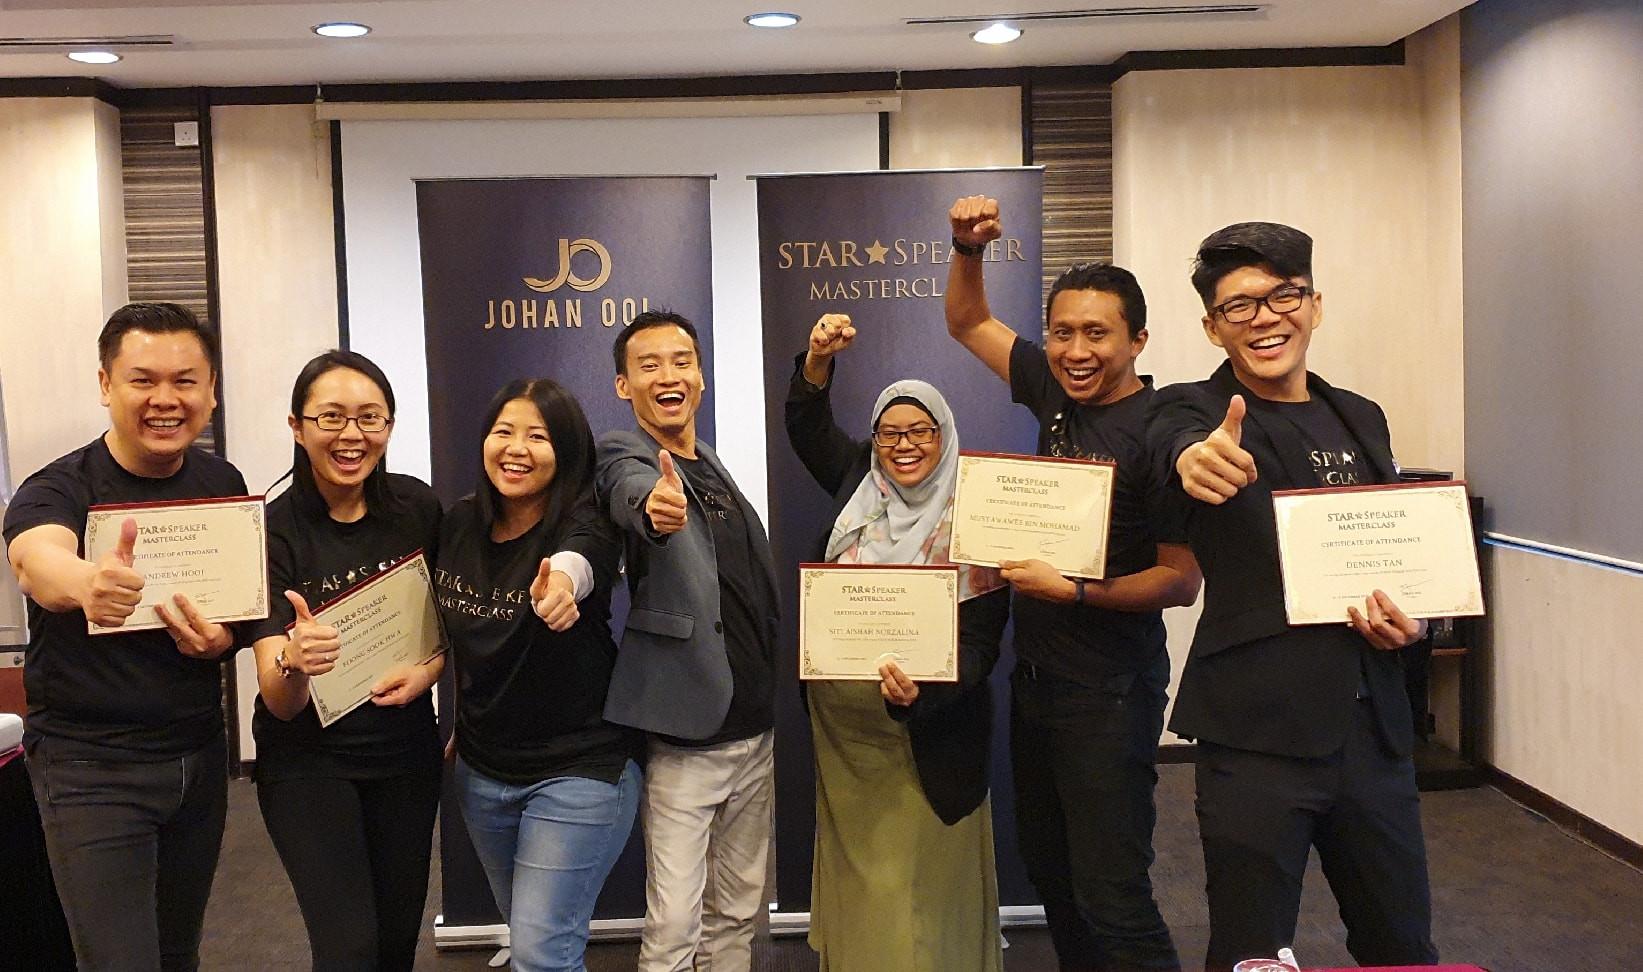 STAR Speaker masterclass johan ooi5.jpg